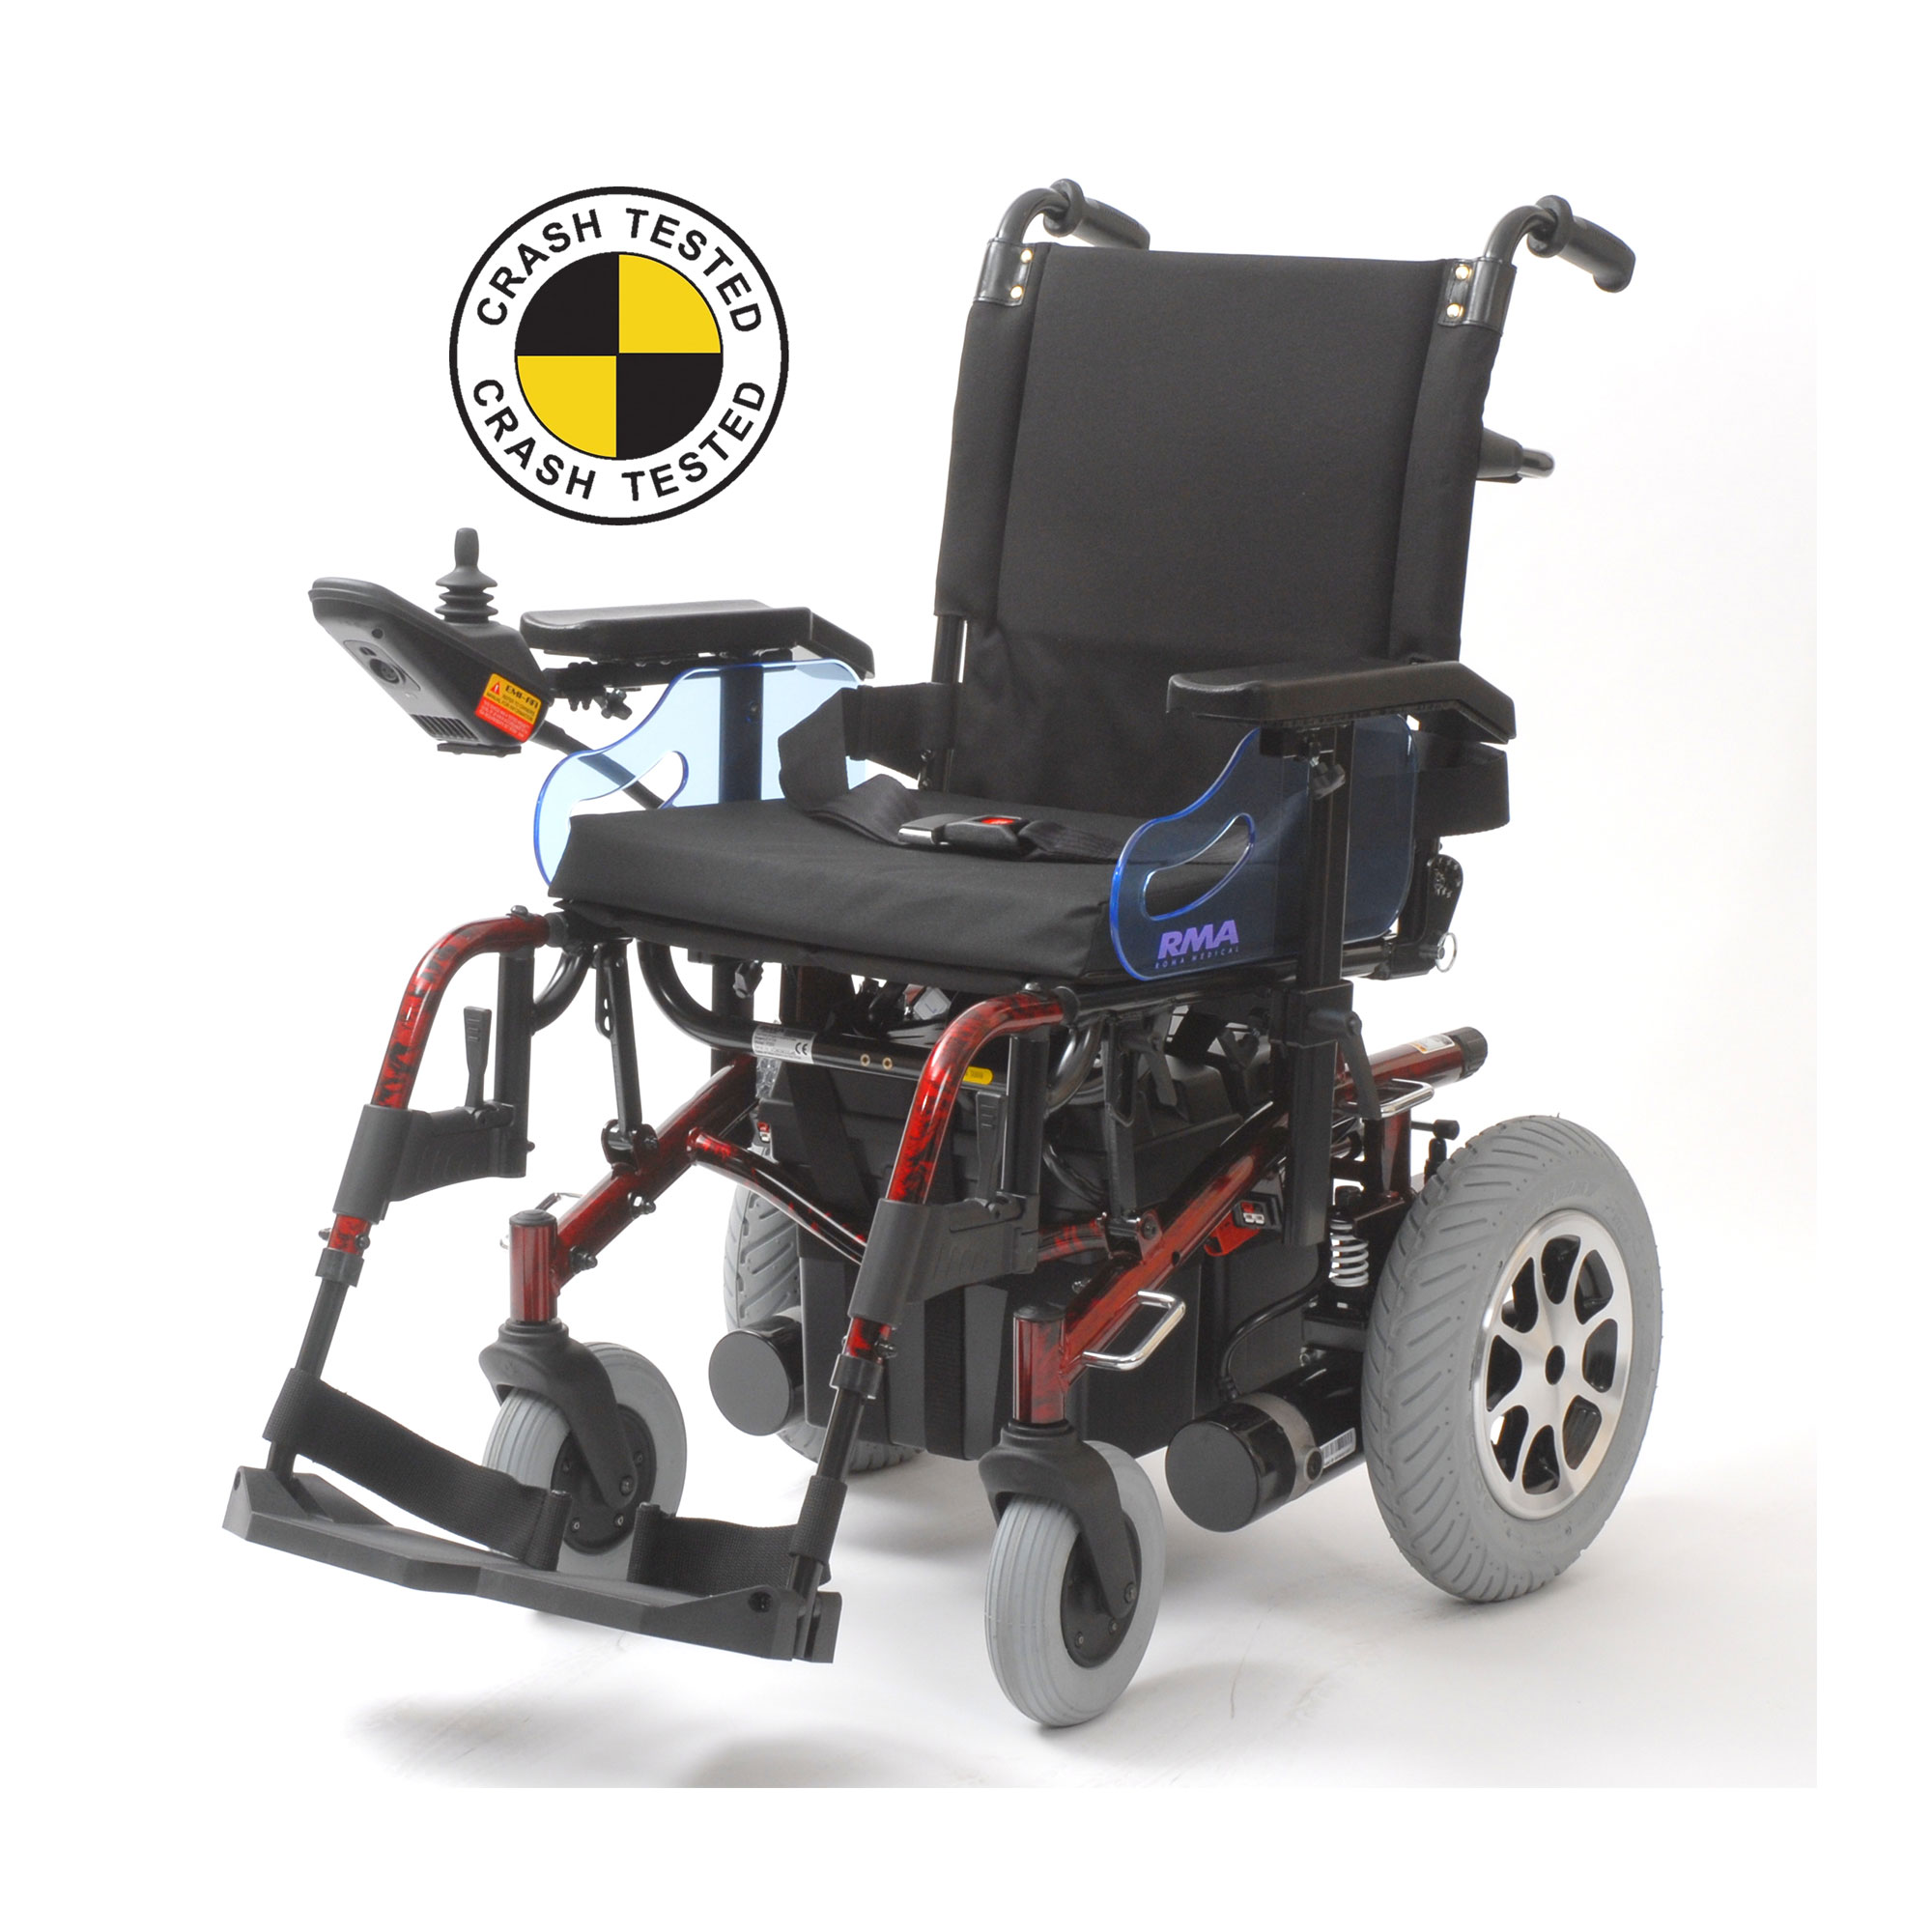 p200 - Power Chairs